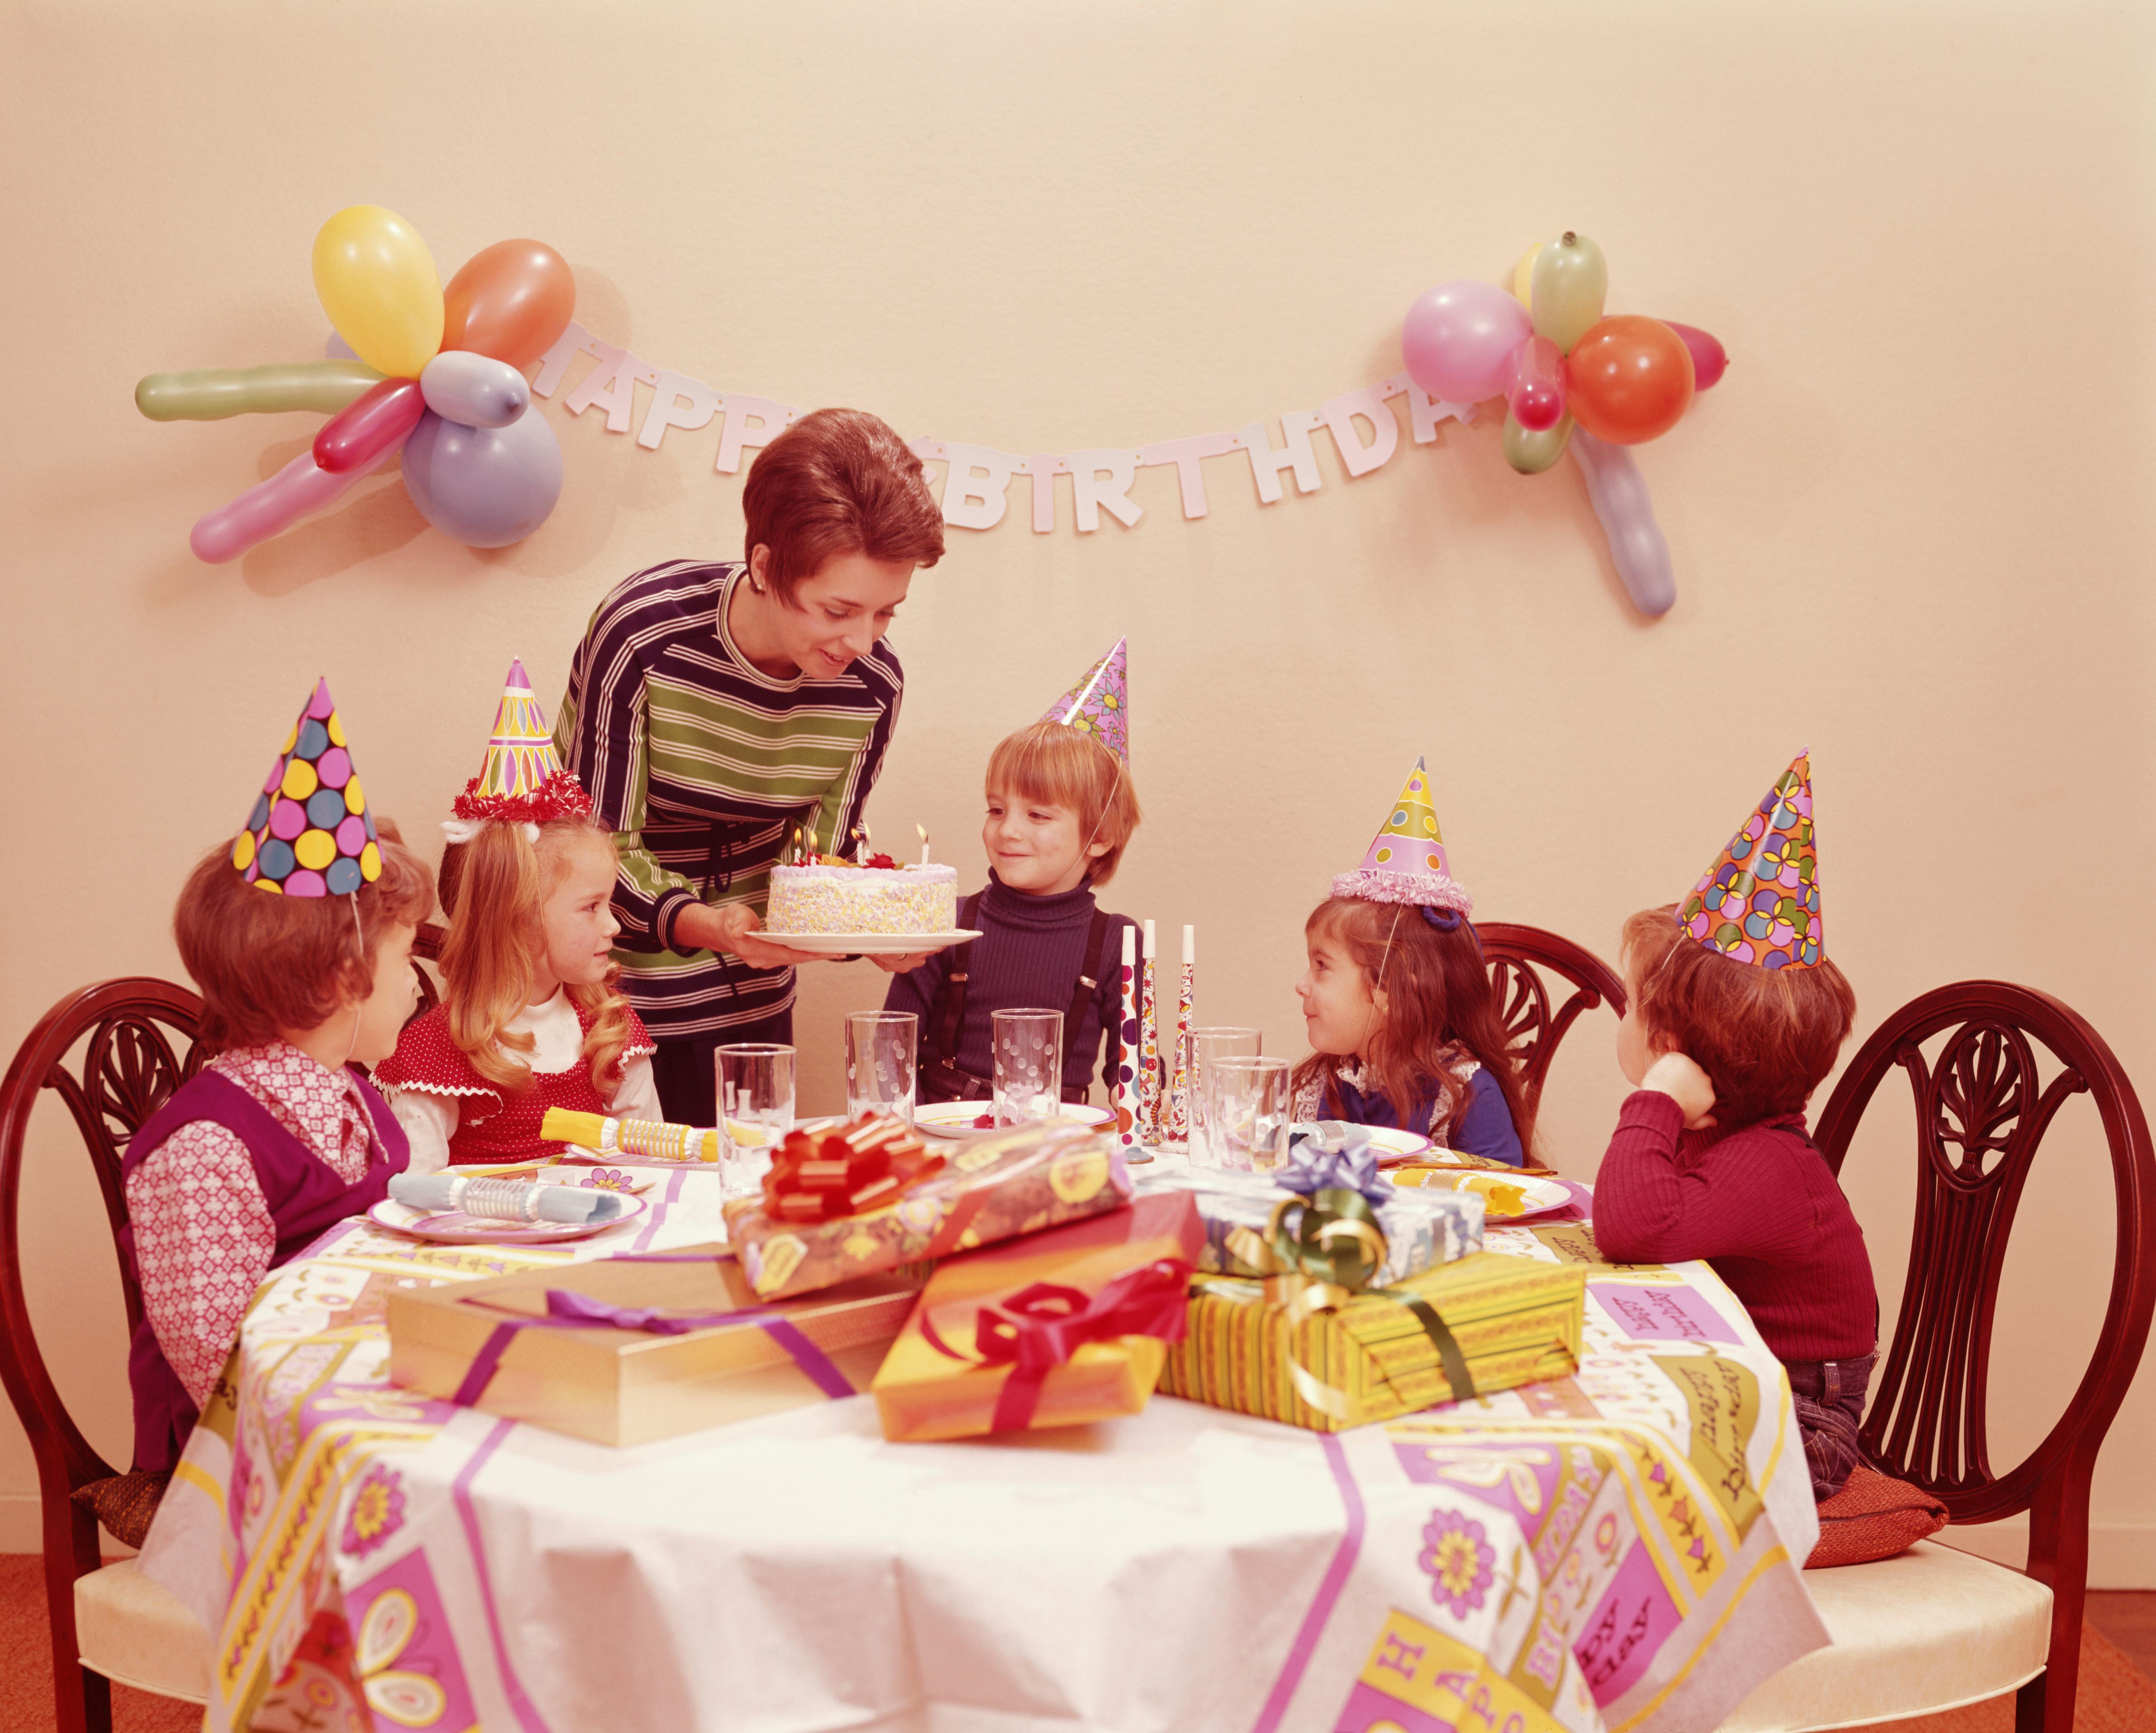 Mother serving birthday cake to children